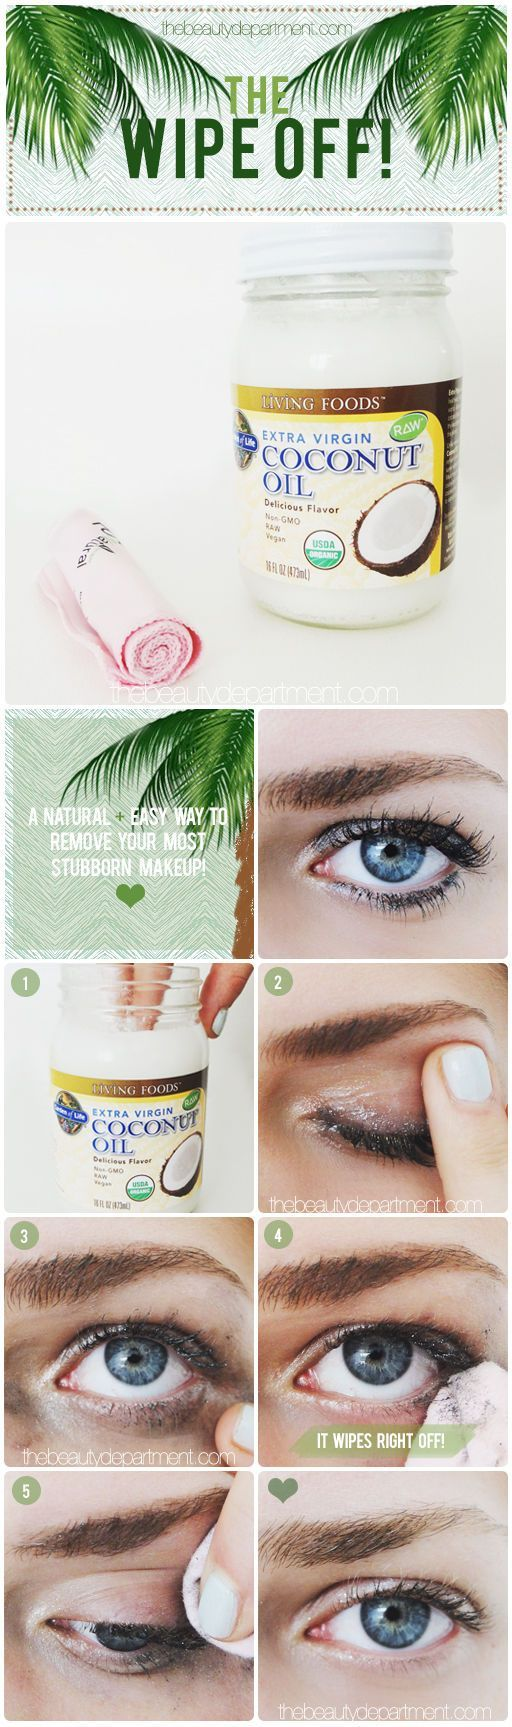 How to Remove Waterproof Eye Makeup - #Beauty, #Makeup, #Waterproof